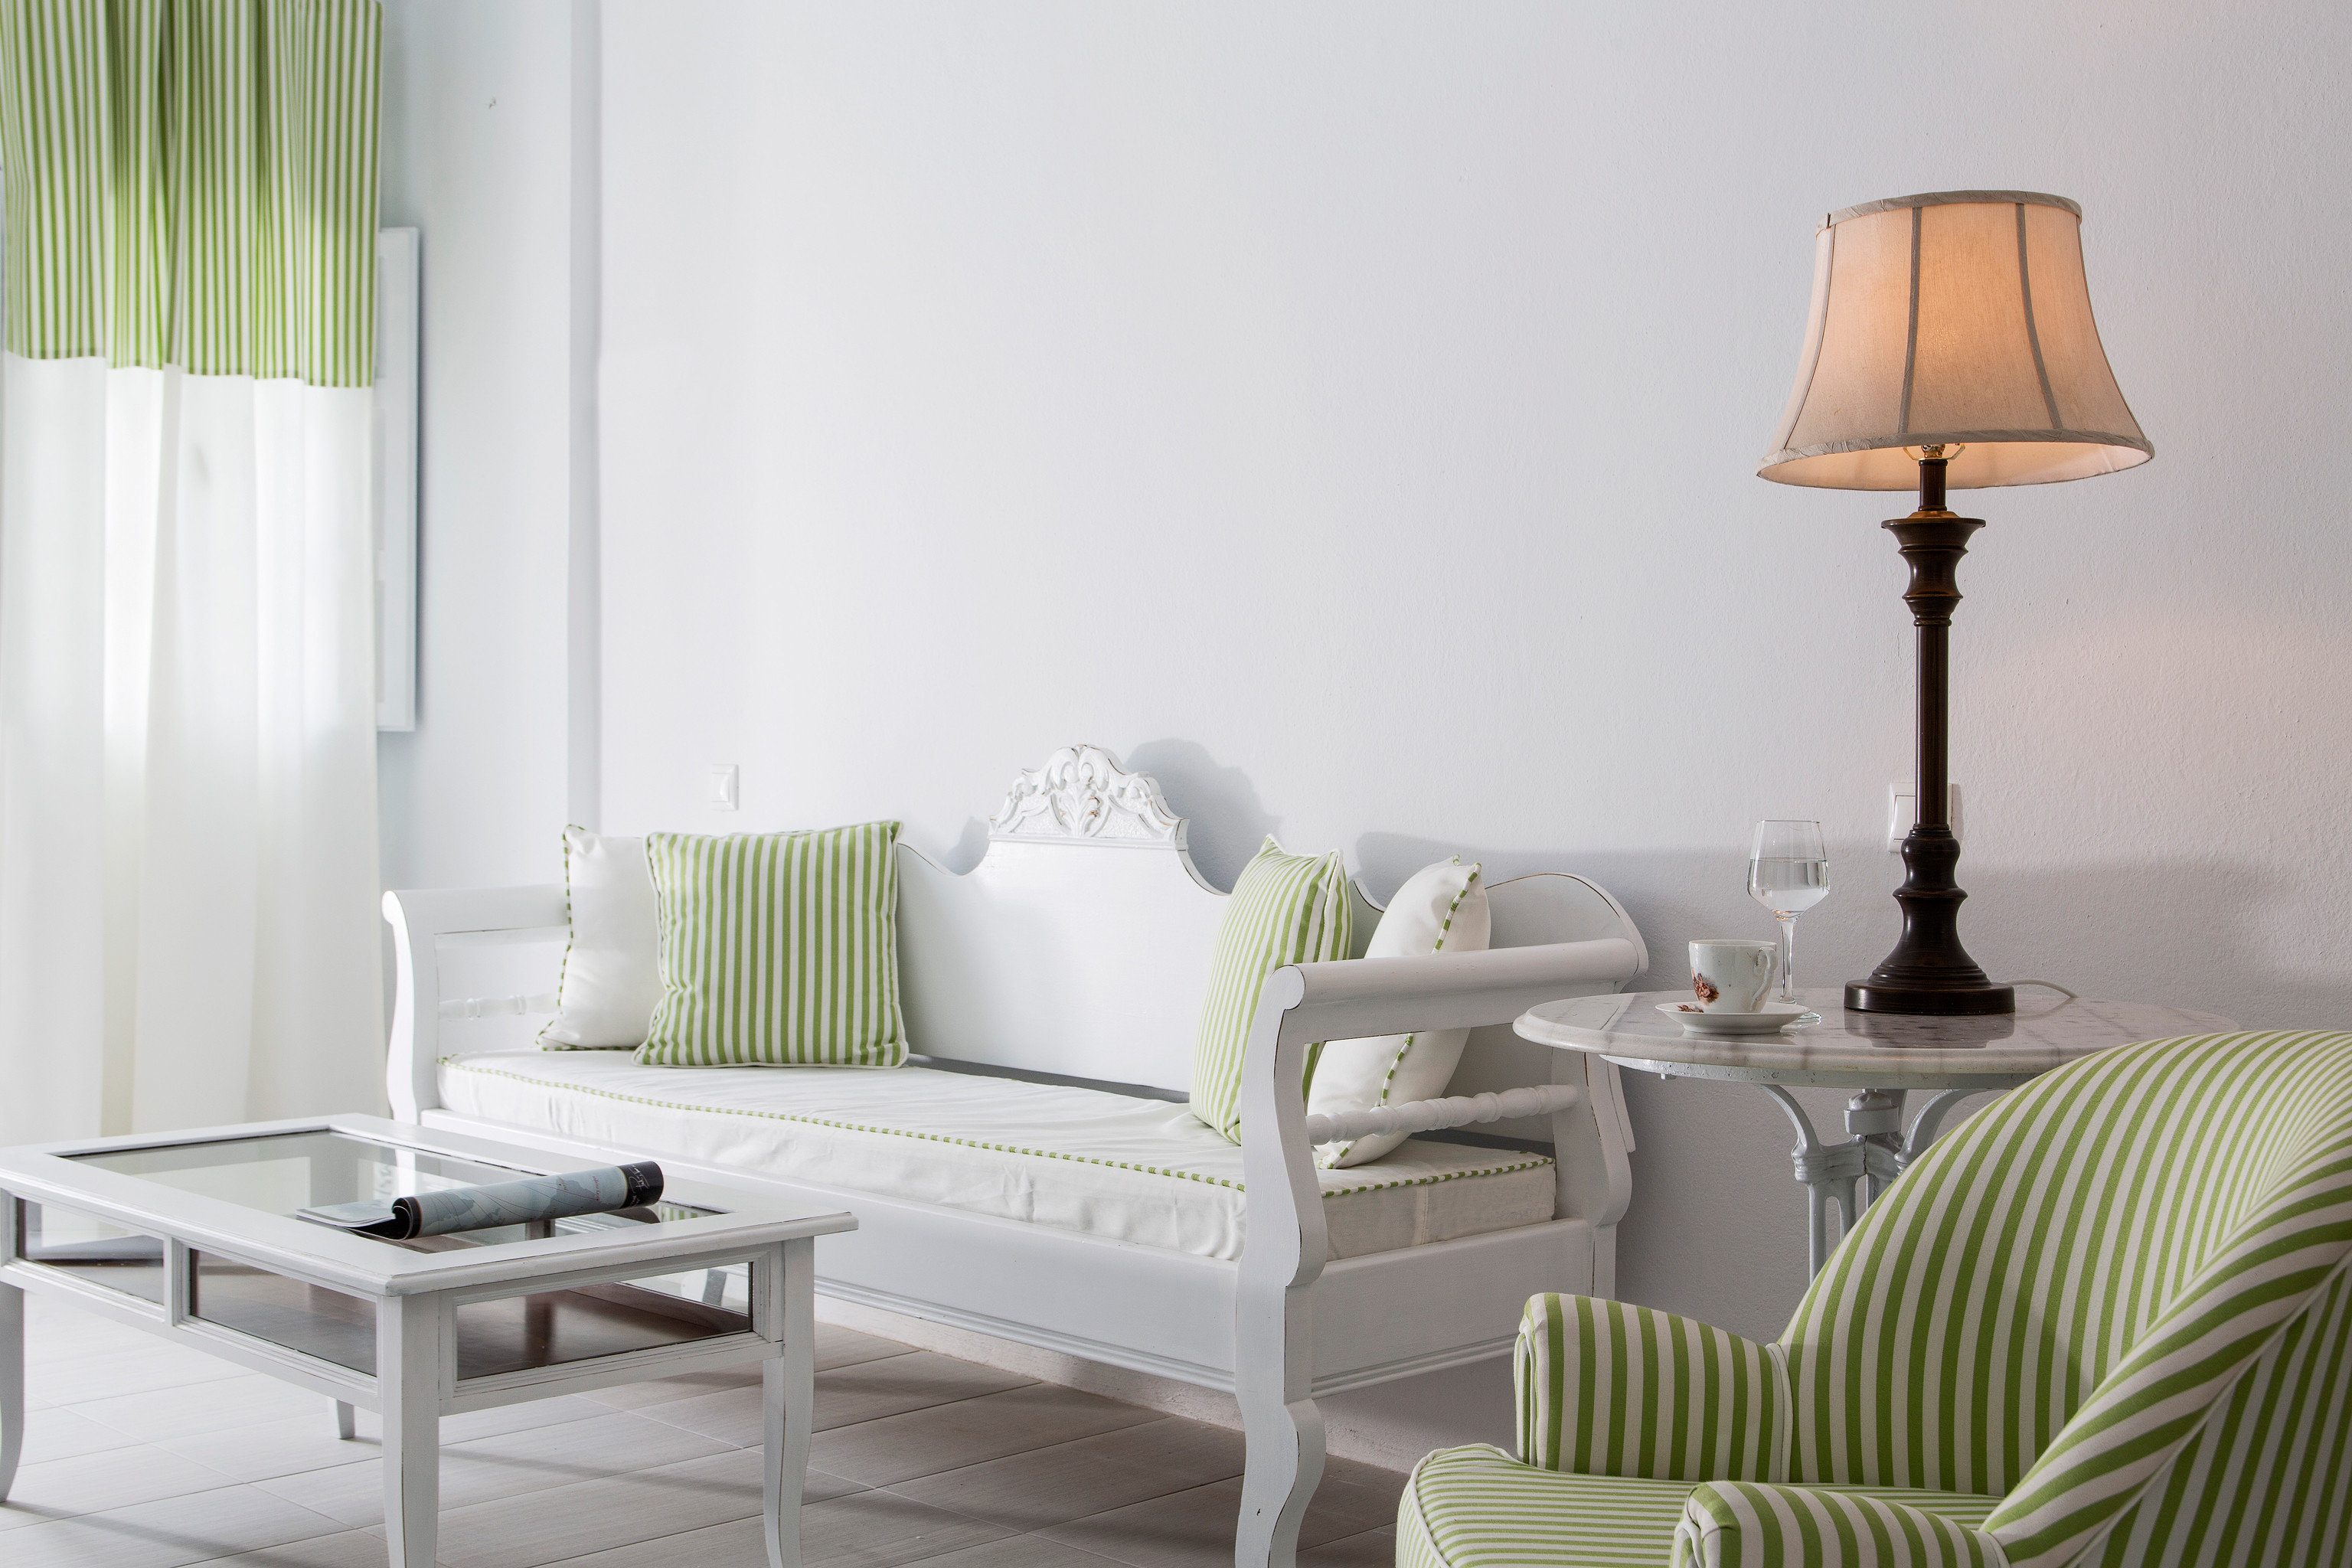 Classic Elegant sofa living room lighting lamp